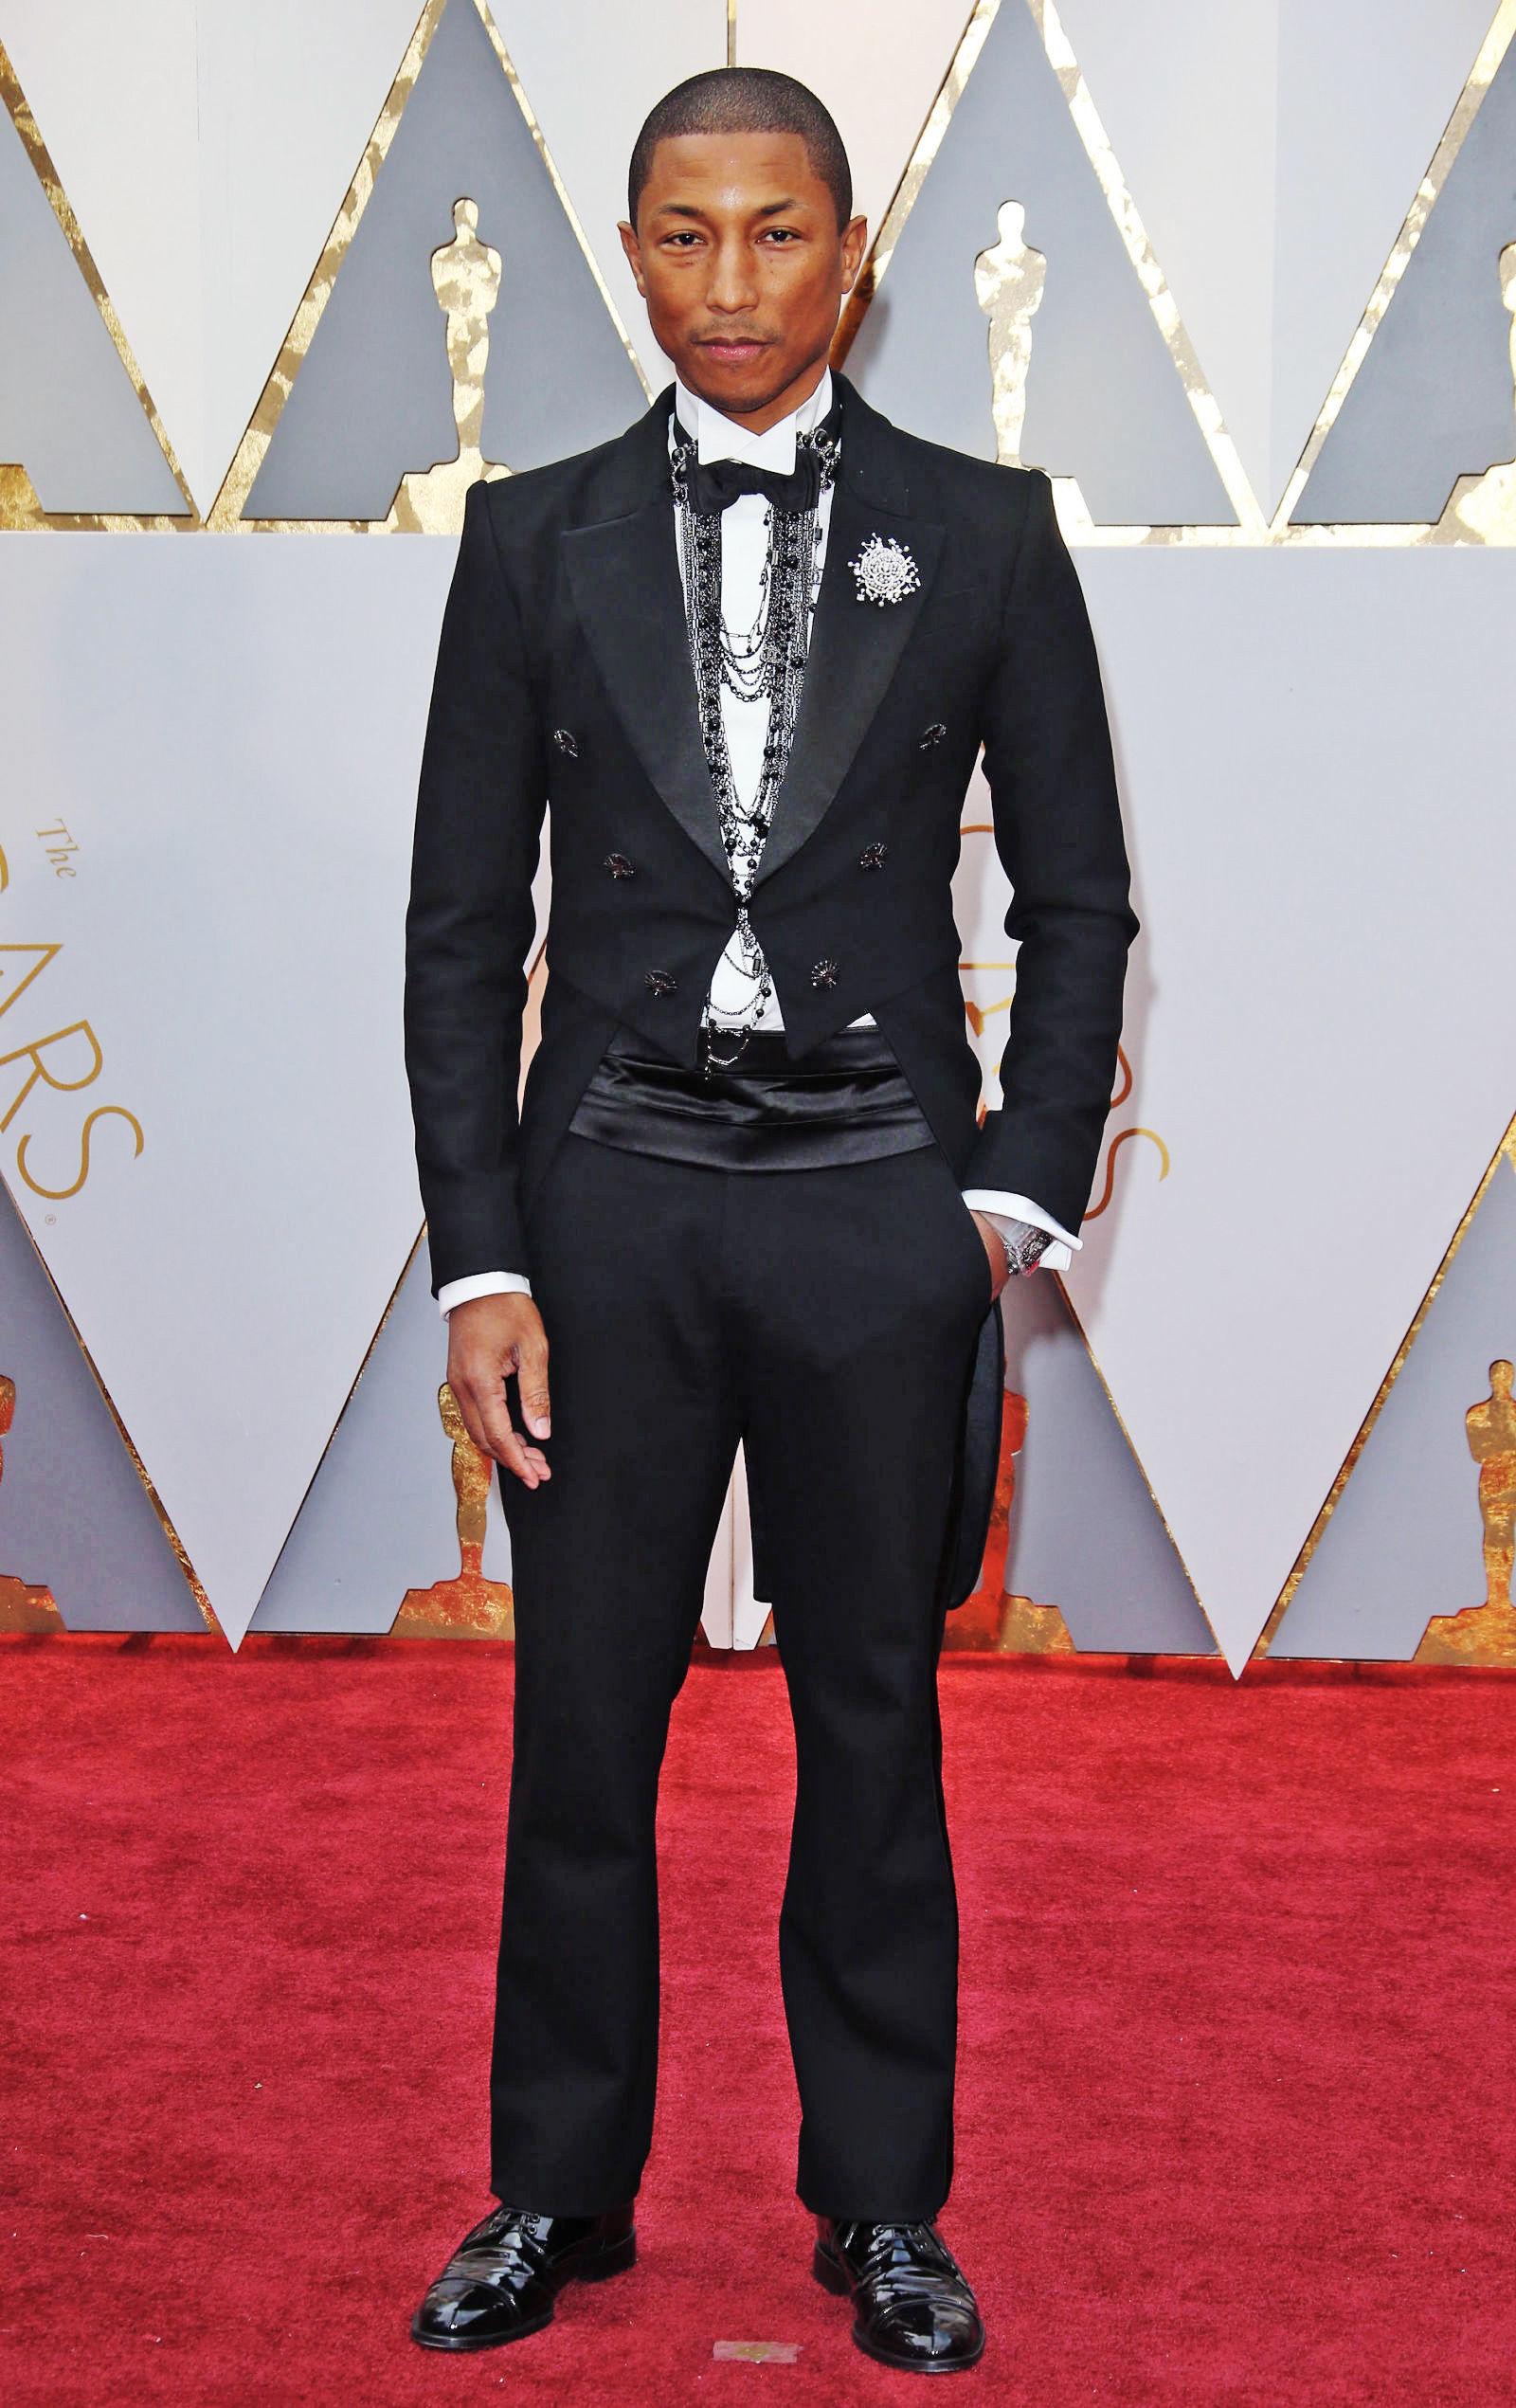 phong cach thoi trang nam - elle man - Pharrell Williams 1